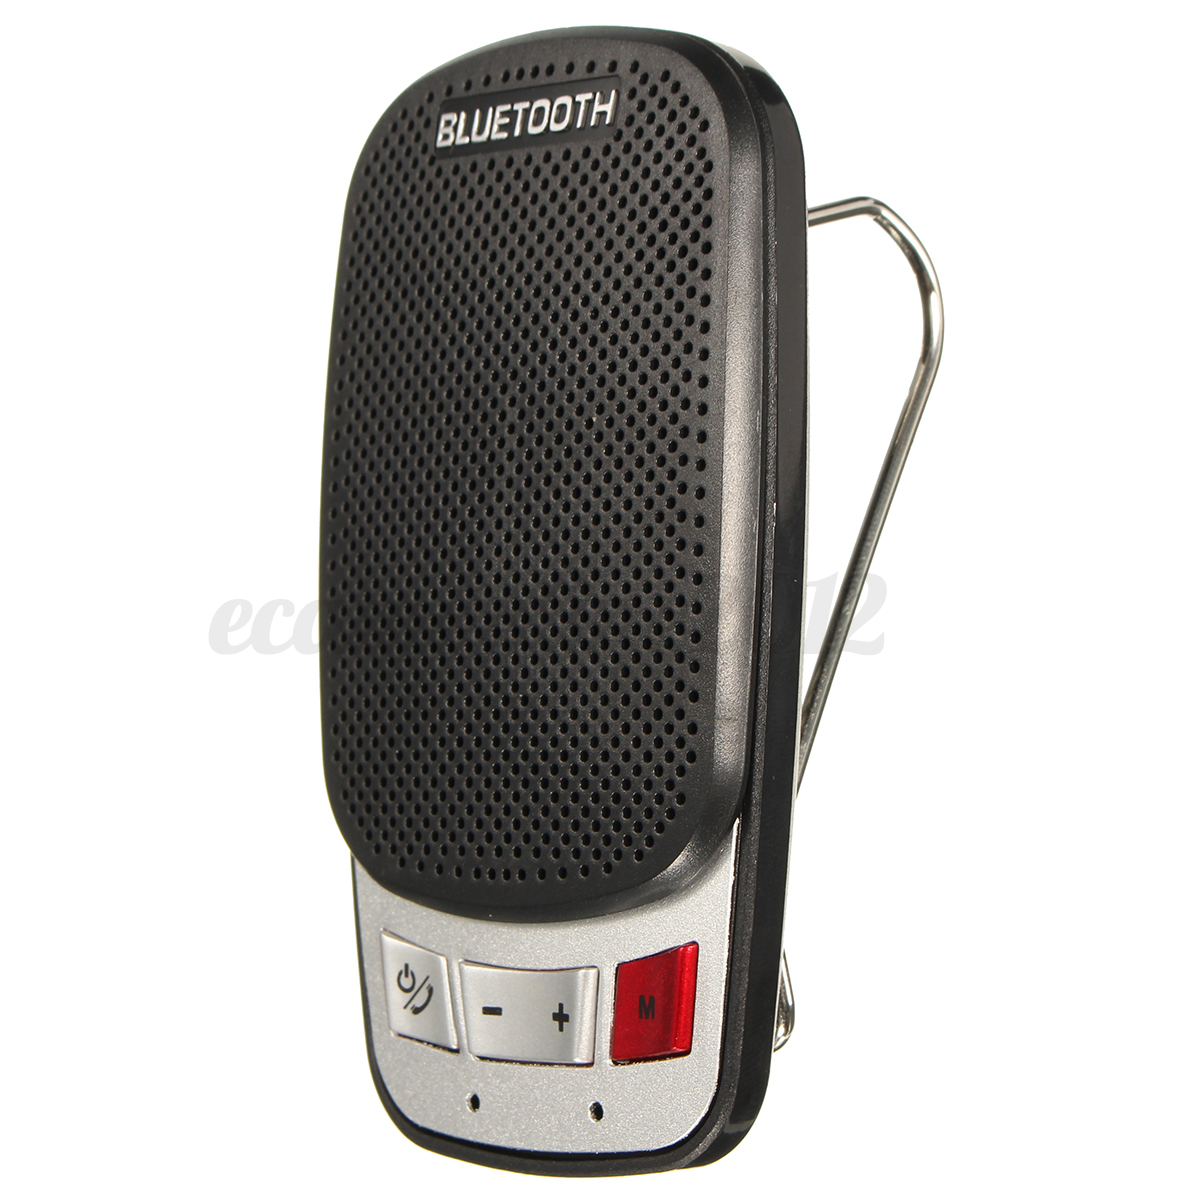 Universal Bluetooth Handsfree Multipoint Speakerphone Speaker For Phone Car Kit